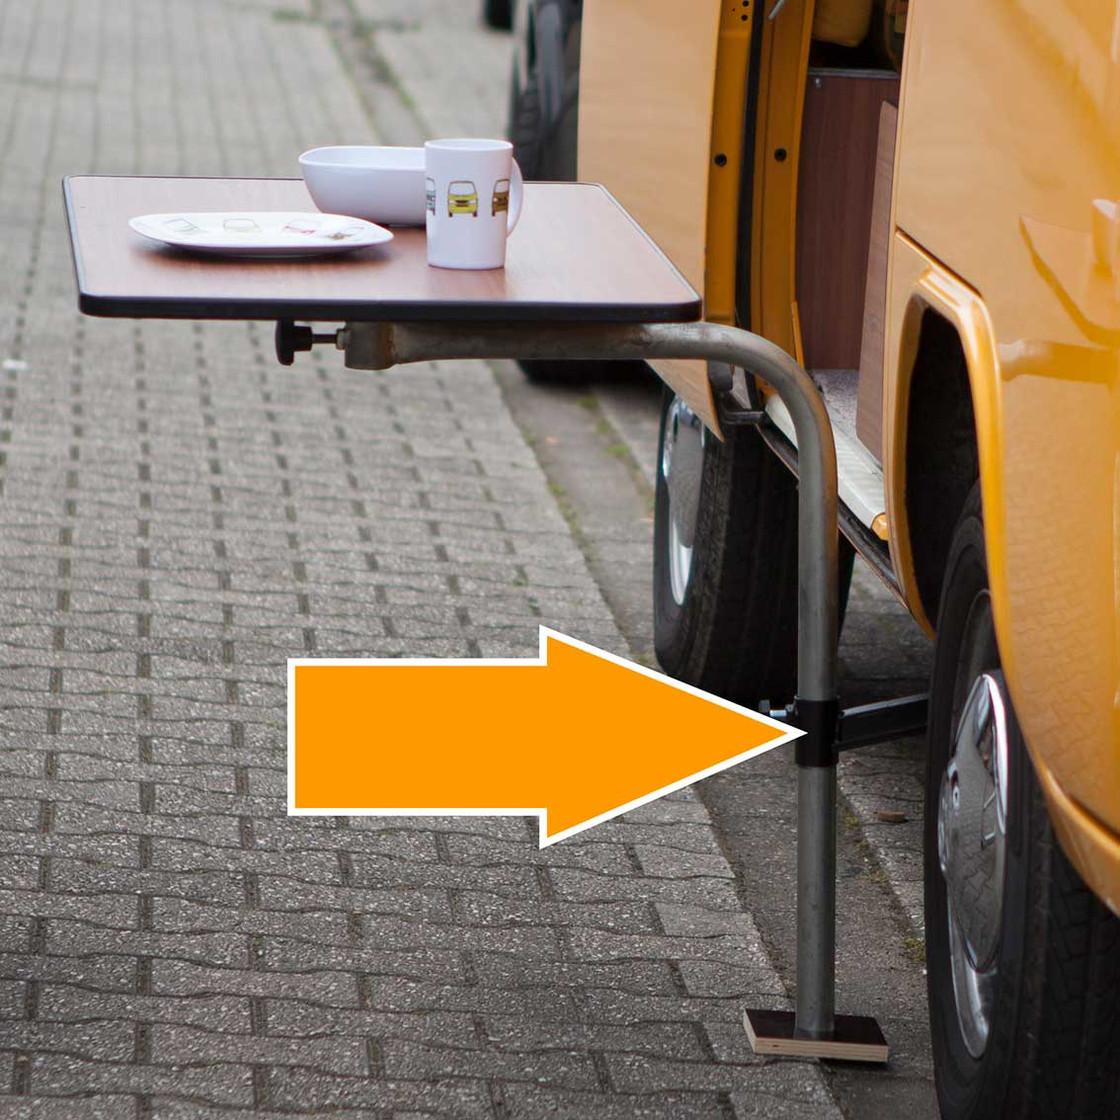 Type2 Bay Window Westfalia Table Bracket For Jacking Point Outdoor E 47 70